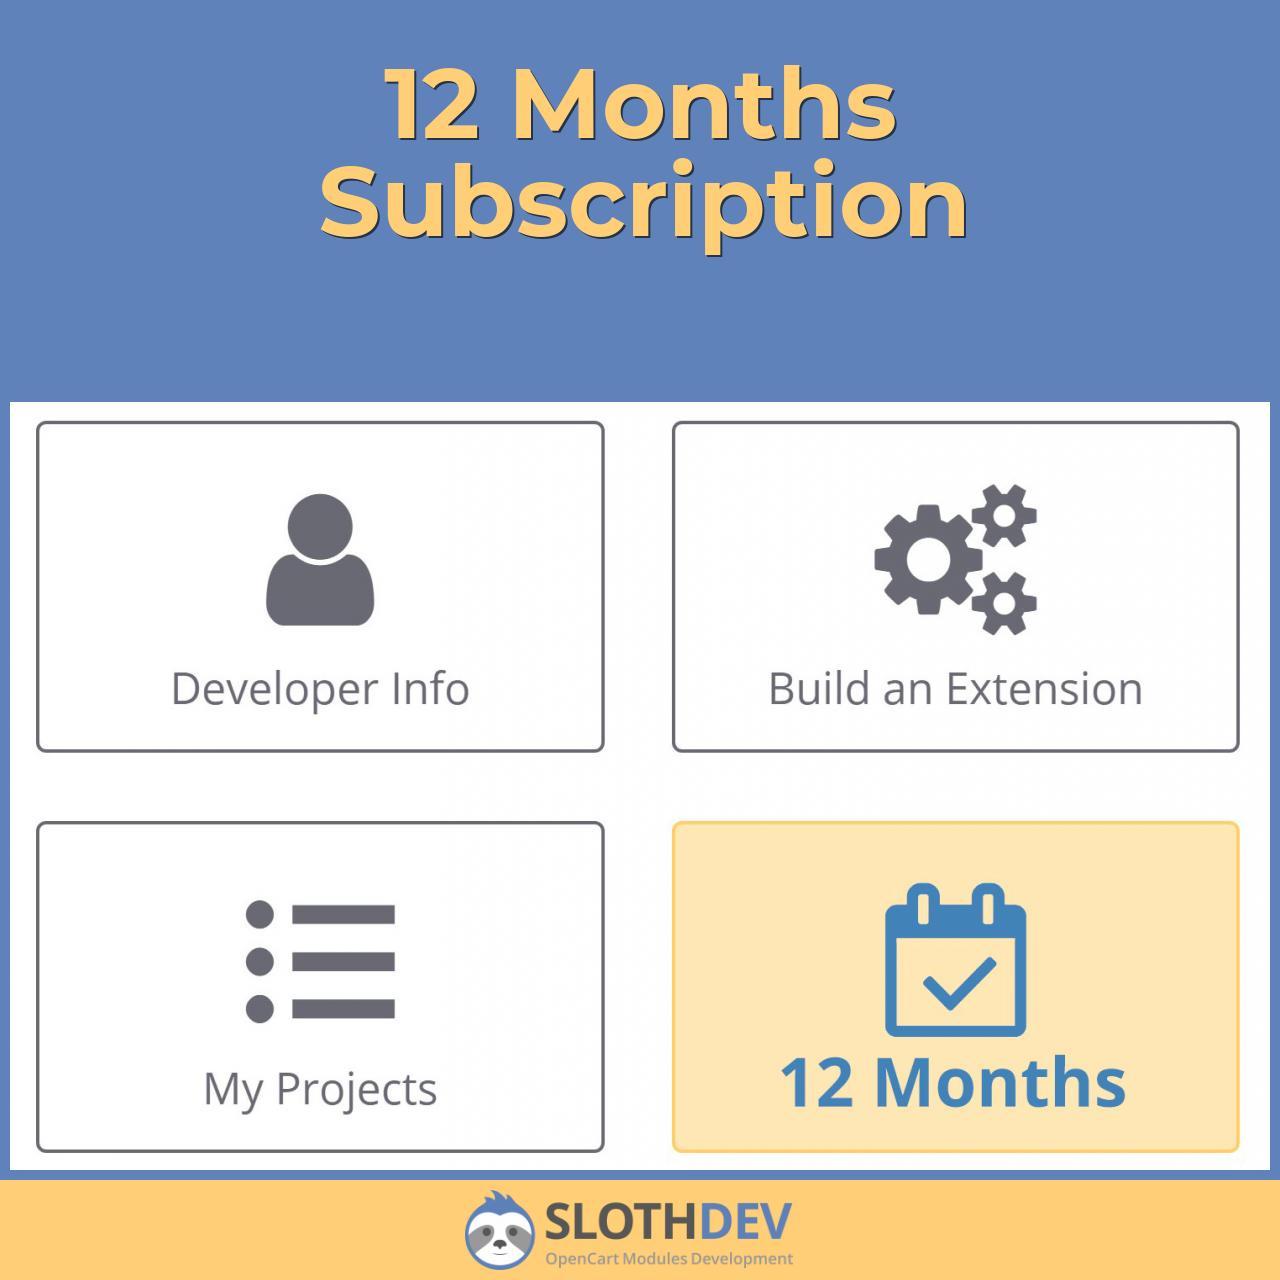 12 Months Subscription